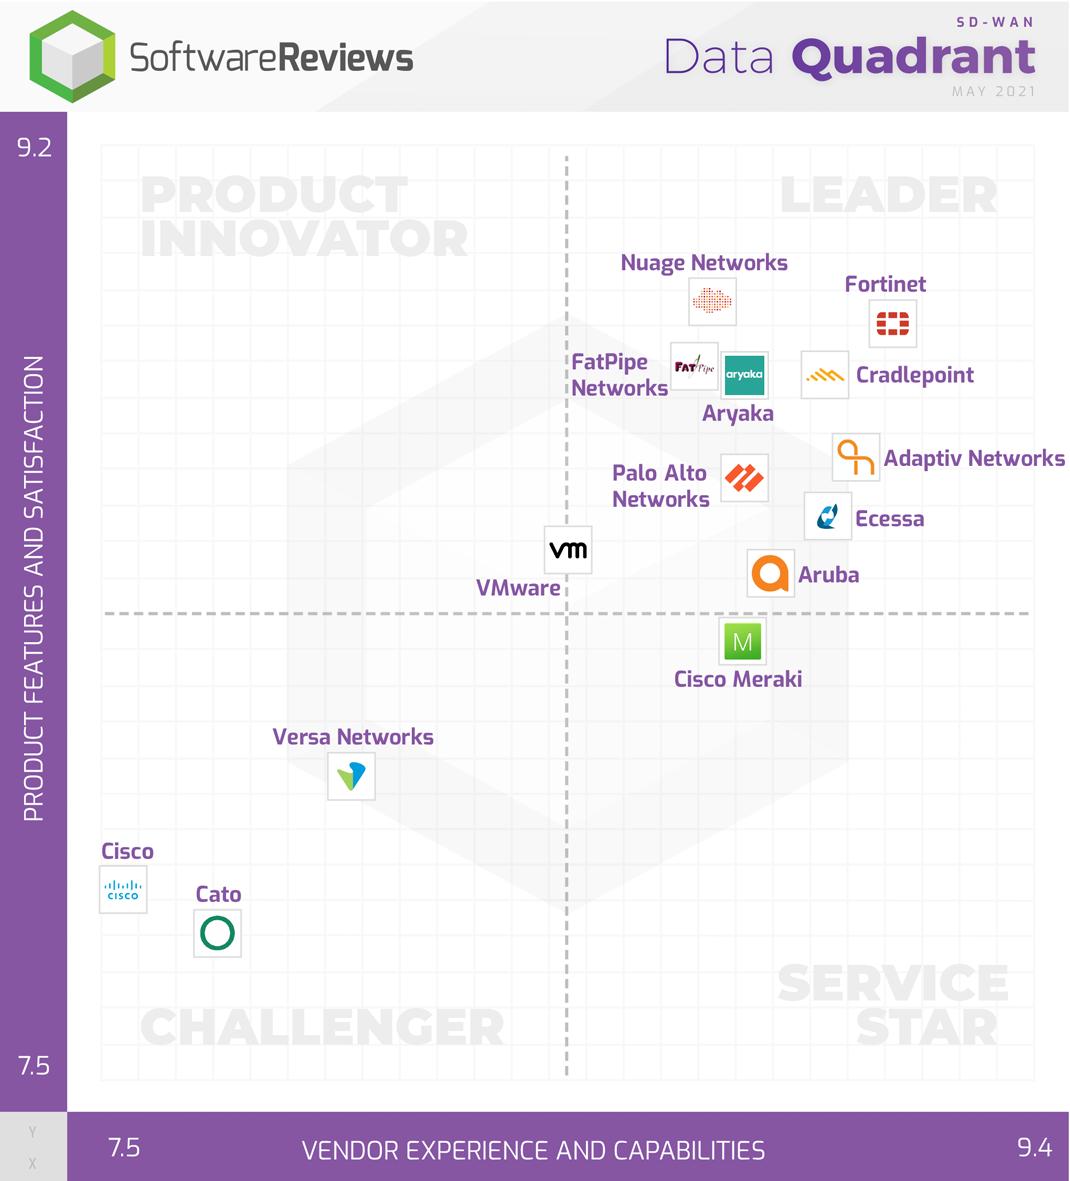 SD-WAN Data Quadrant